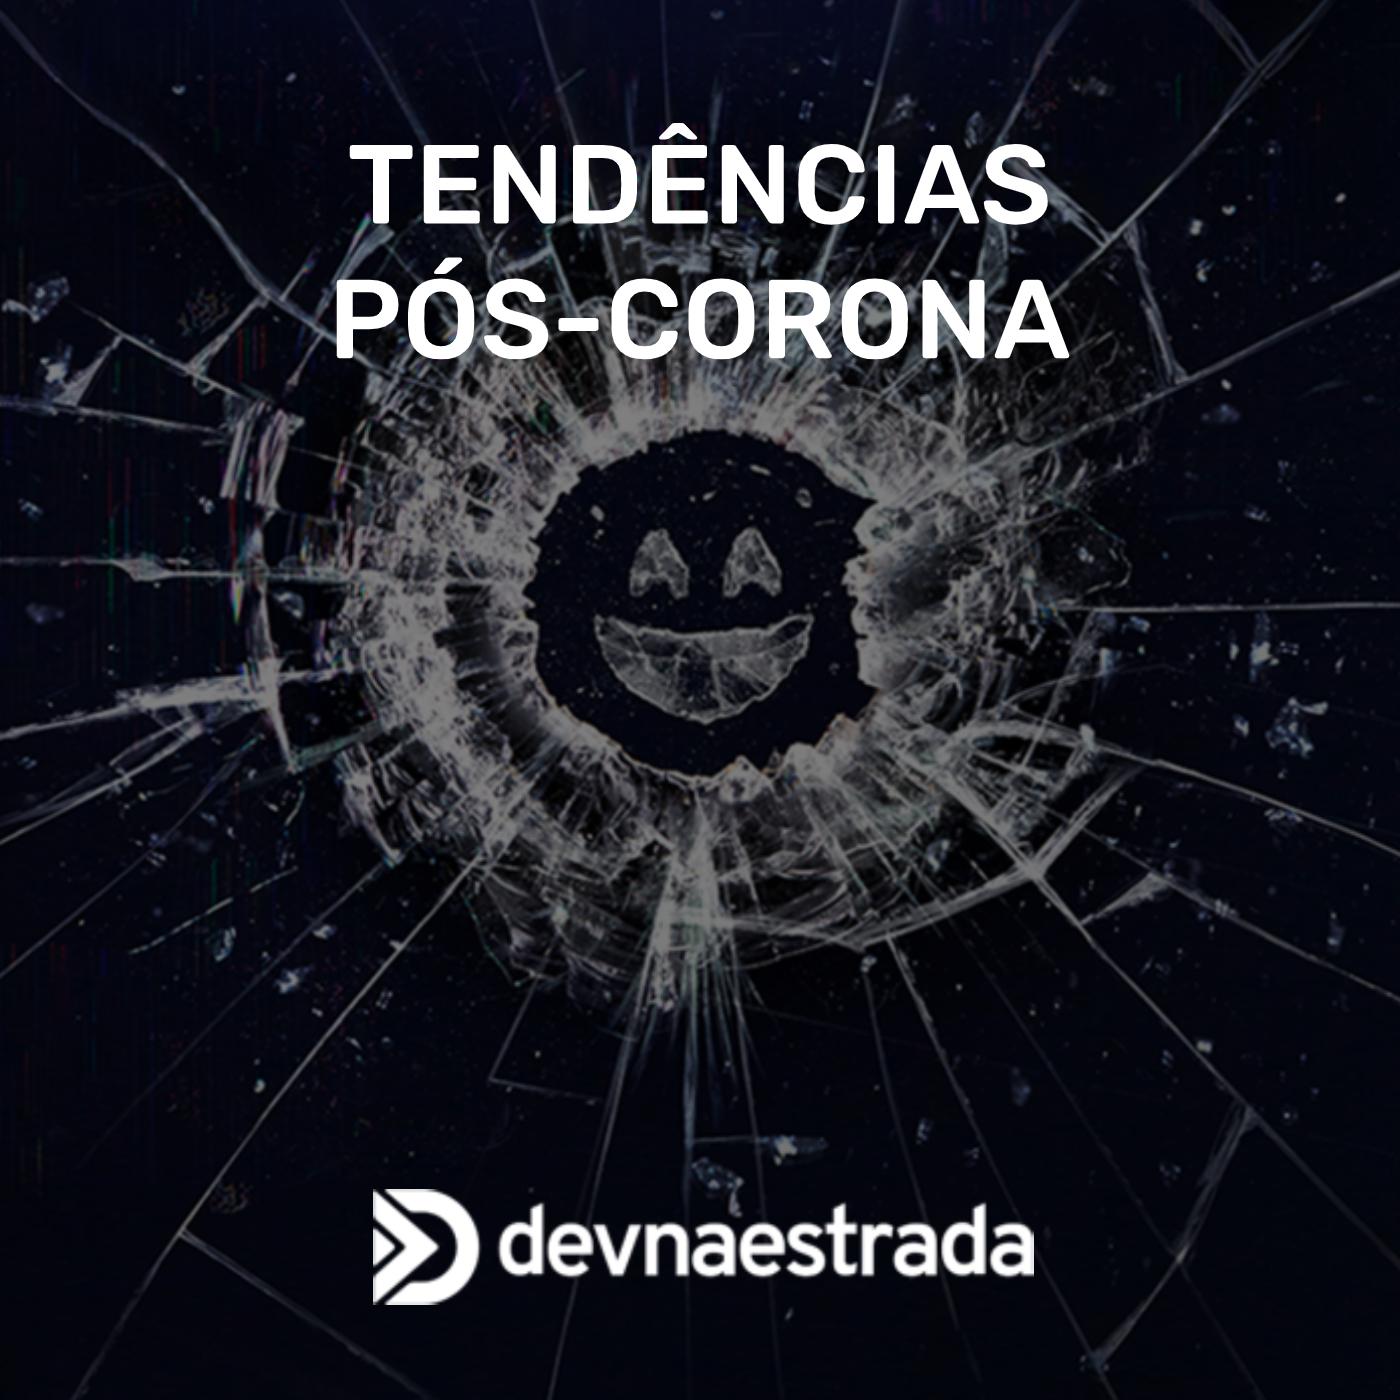 Tendências Pós-Corona